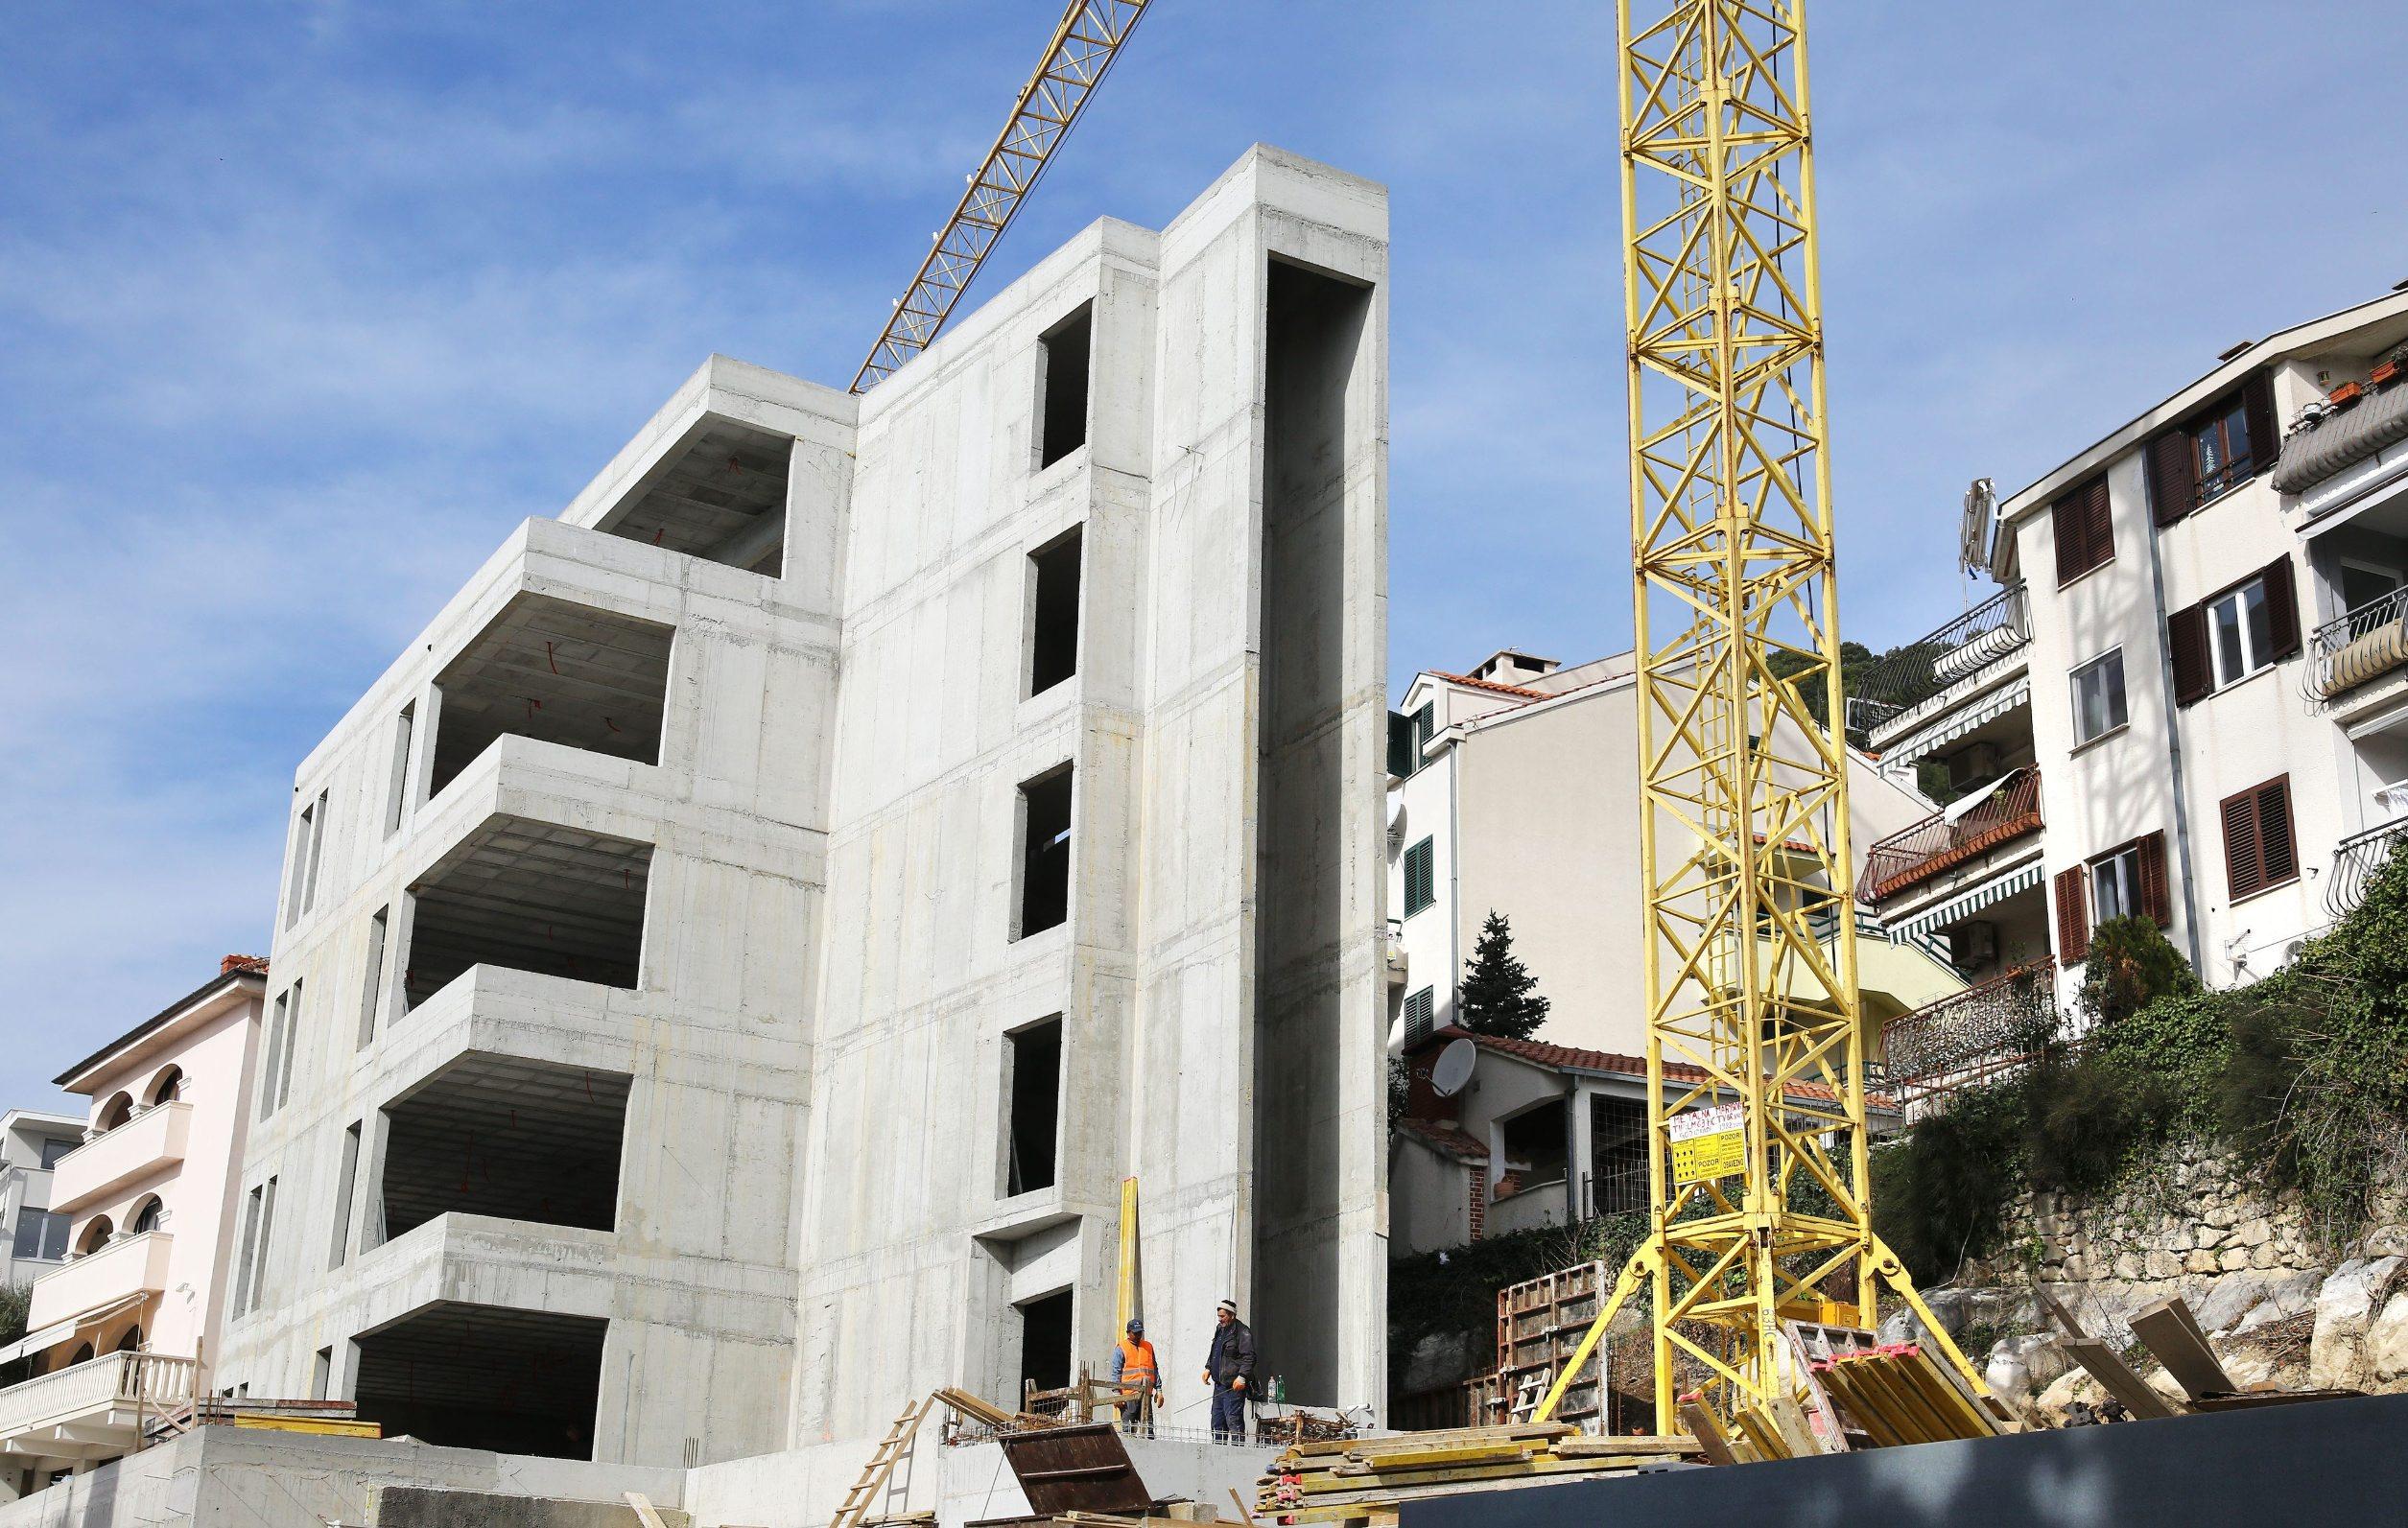 Split, 240220. Velika betonska zgrada na Mejama u Mihanovicevoj ulici zagradila je okolne stanare. Zgrada je neproporcionalna visinom u odnosu na ostale kuce i objekte oko nje. Vlasnik parcele je poduzetnik Baldasar Vukasovic. Foto: Duje Klaric / CROPIX